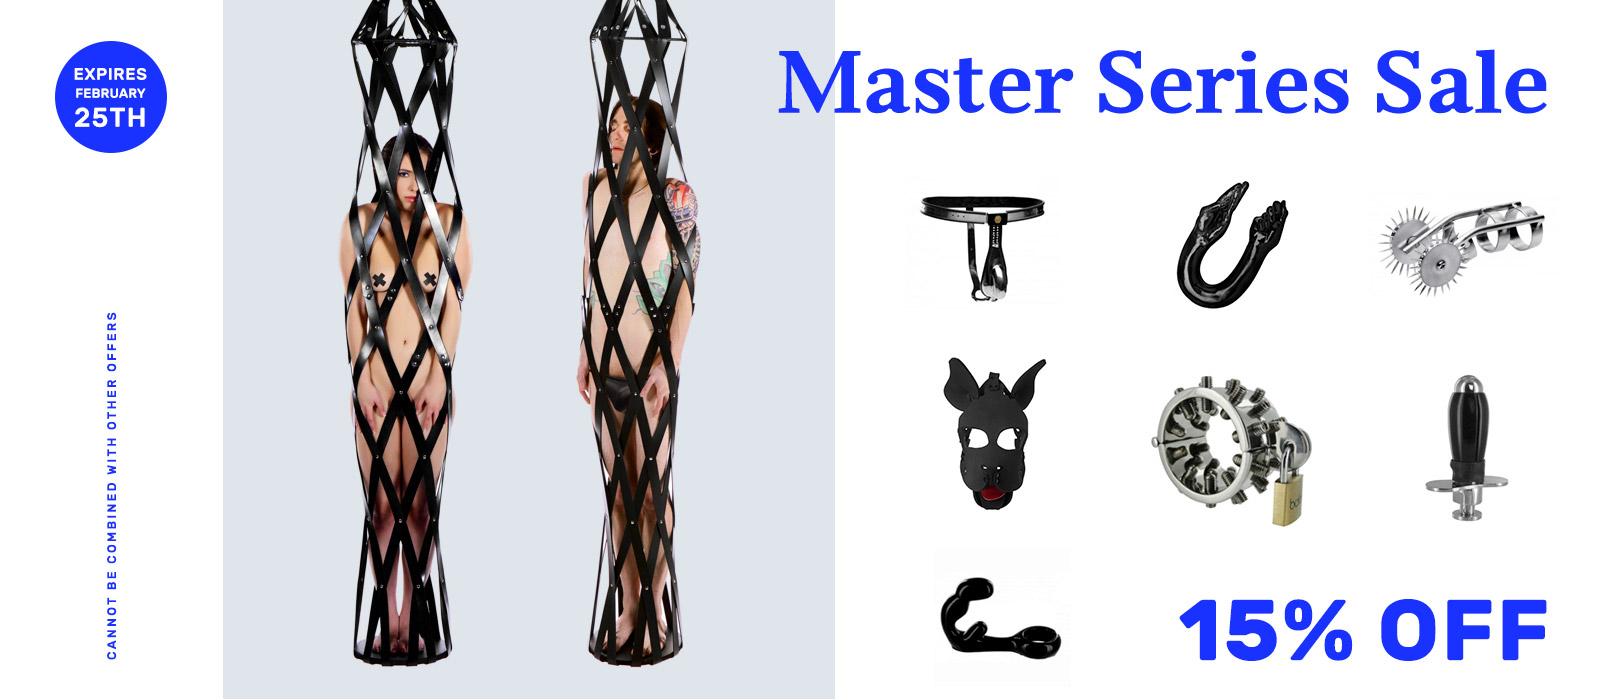 Master Series Bondage Gear Sale